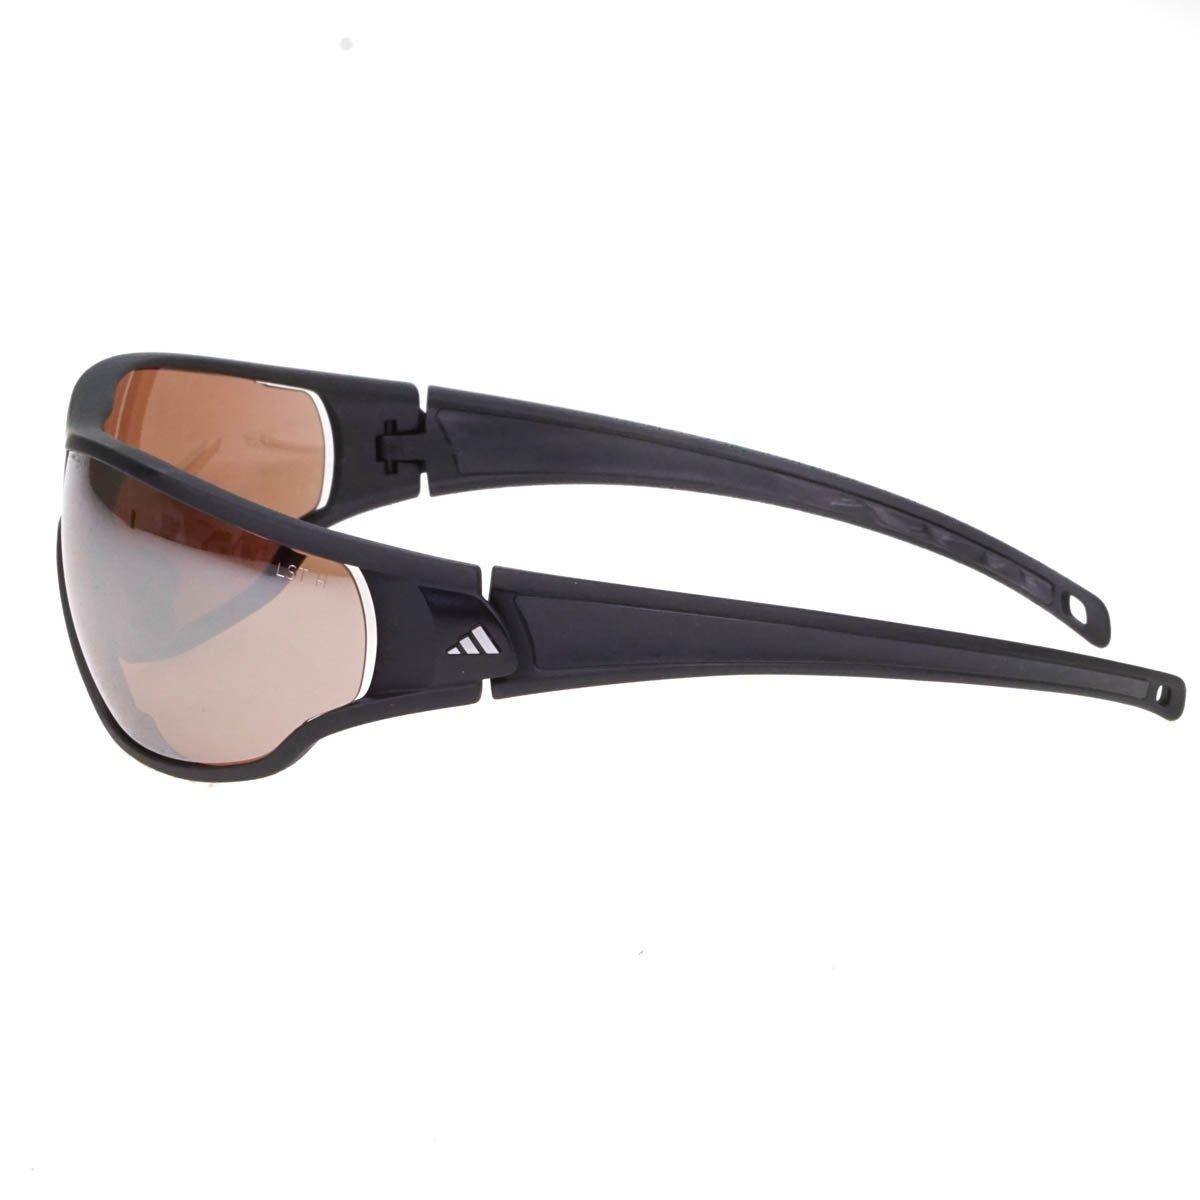 adidas Sonnenbrille Tycane L (A191 6058 74) 27CT2